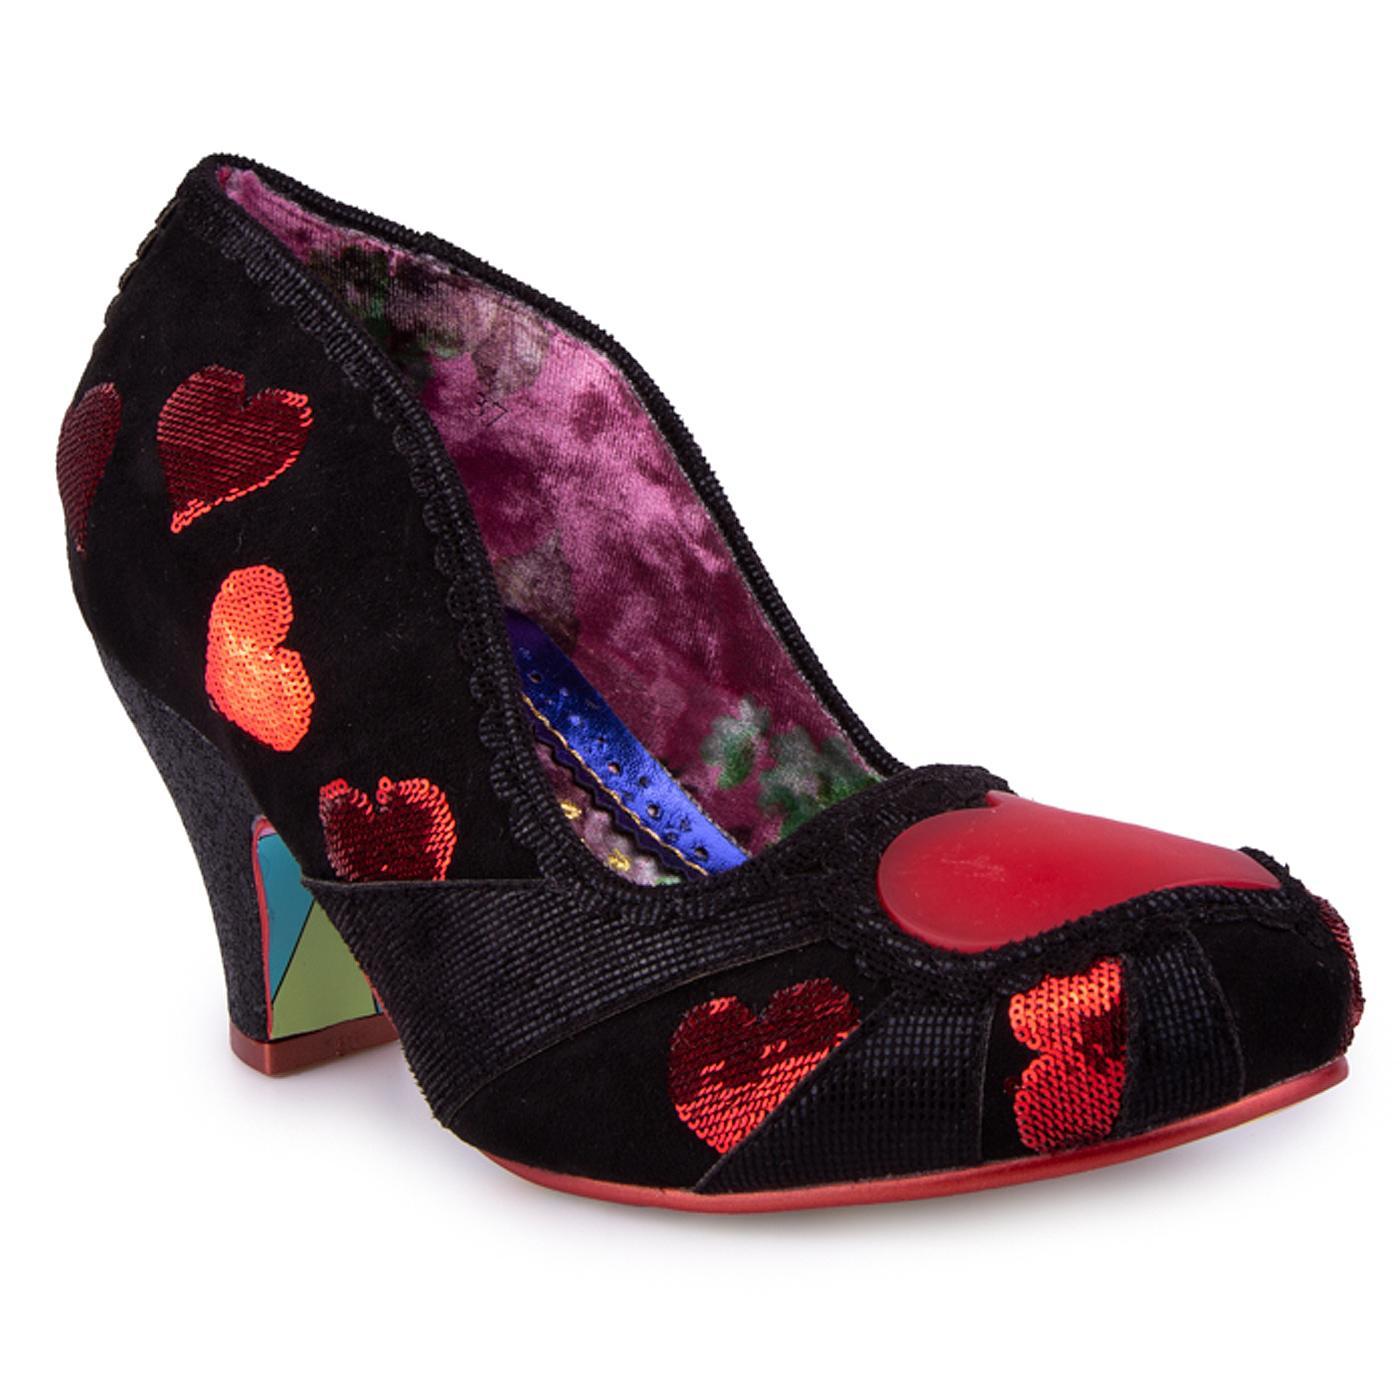 Heart On Your Sleeve IRREGULAR CHOICE Shoes B